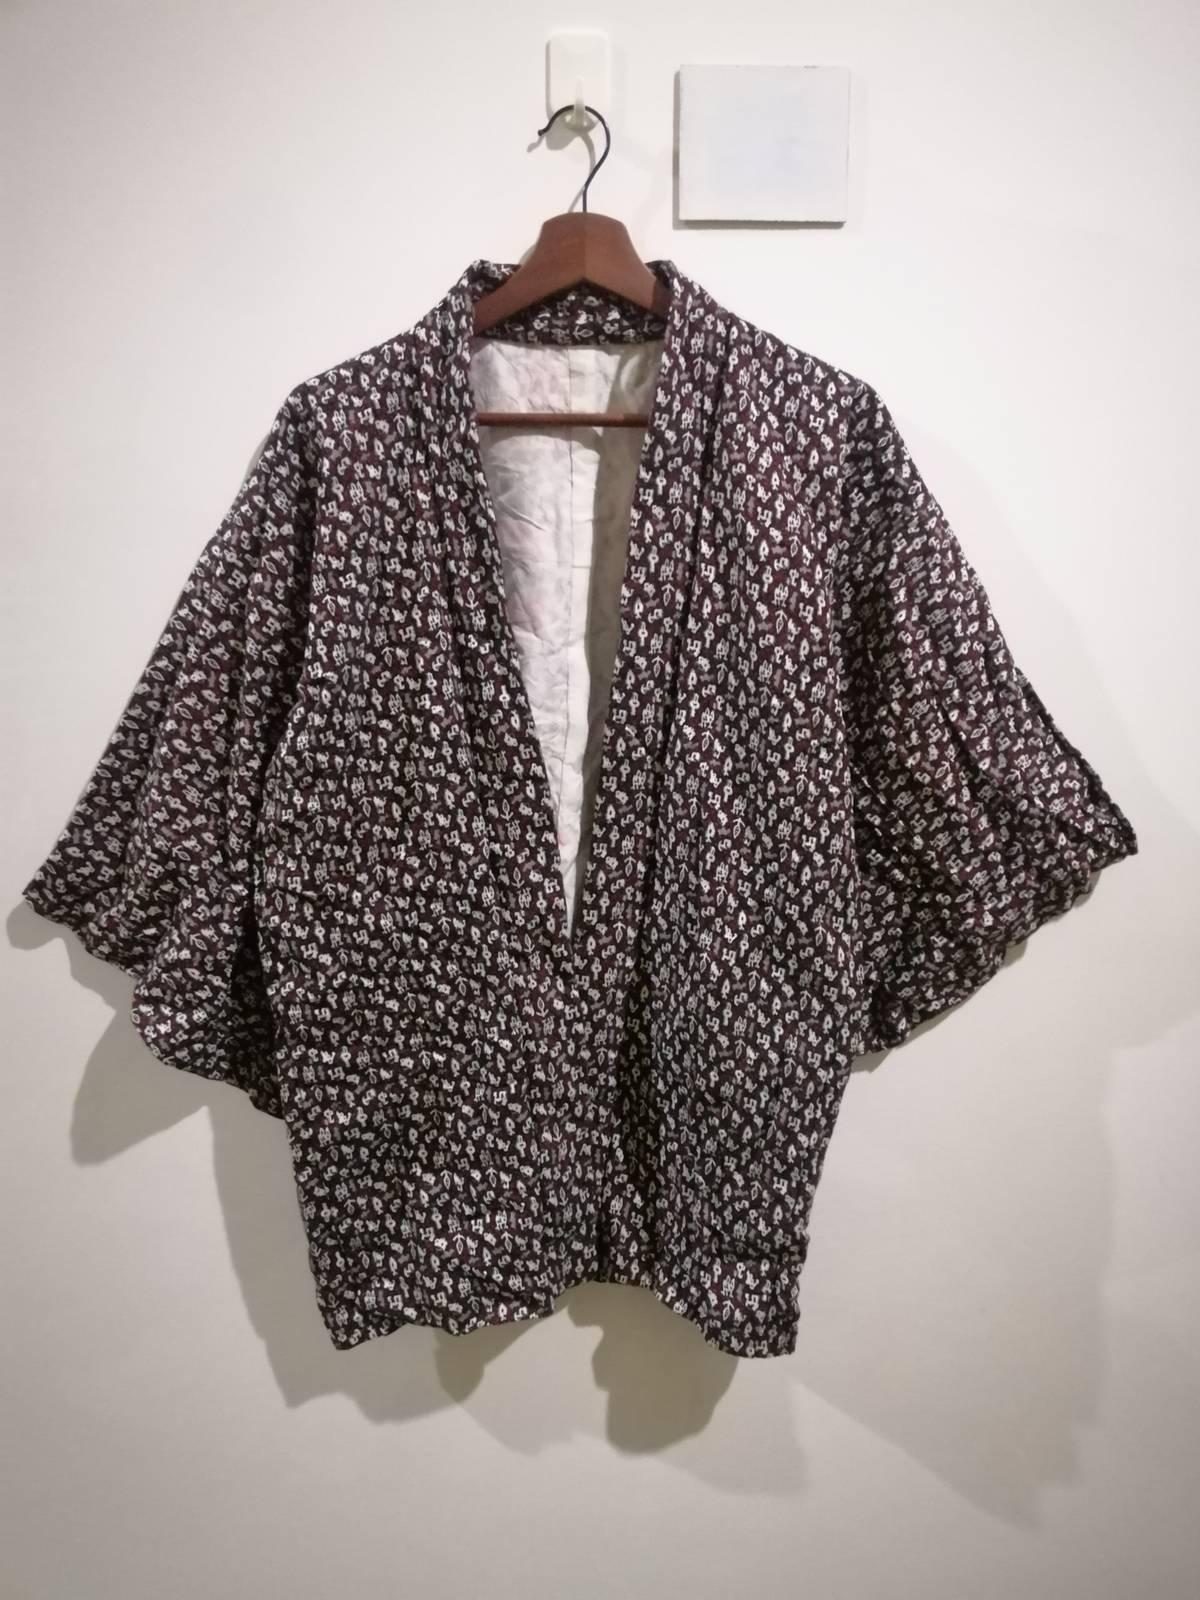 FREE SHIPPING Everywhere Vintage Noragi Kimono Haori Hanten Jinbei Japanese   Cardigan Happi Jacket B560 Pattern